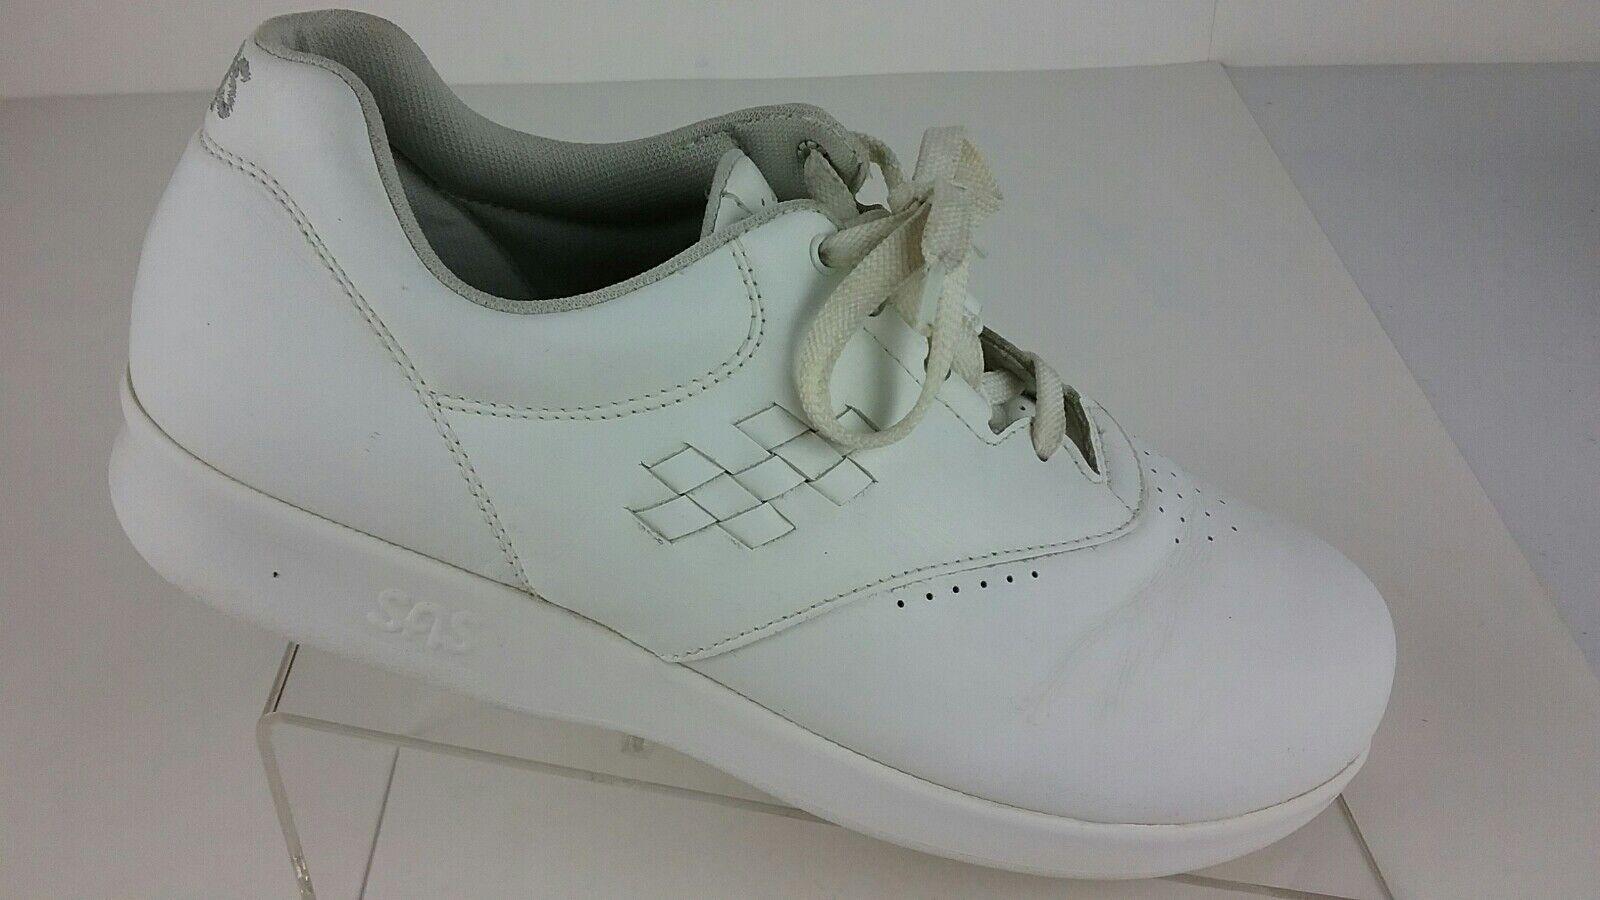 SAS Free Time Tripad Comfort Women's 8.5 M White Lace Up shoes R1- S 7